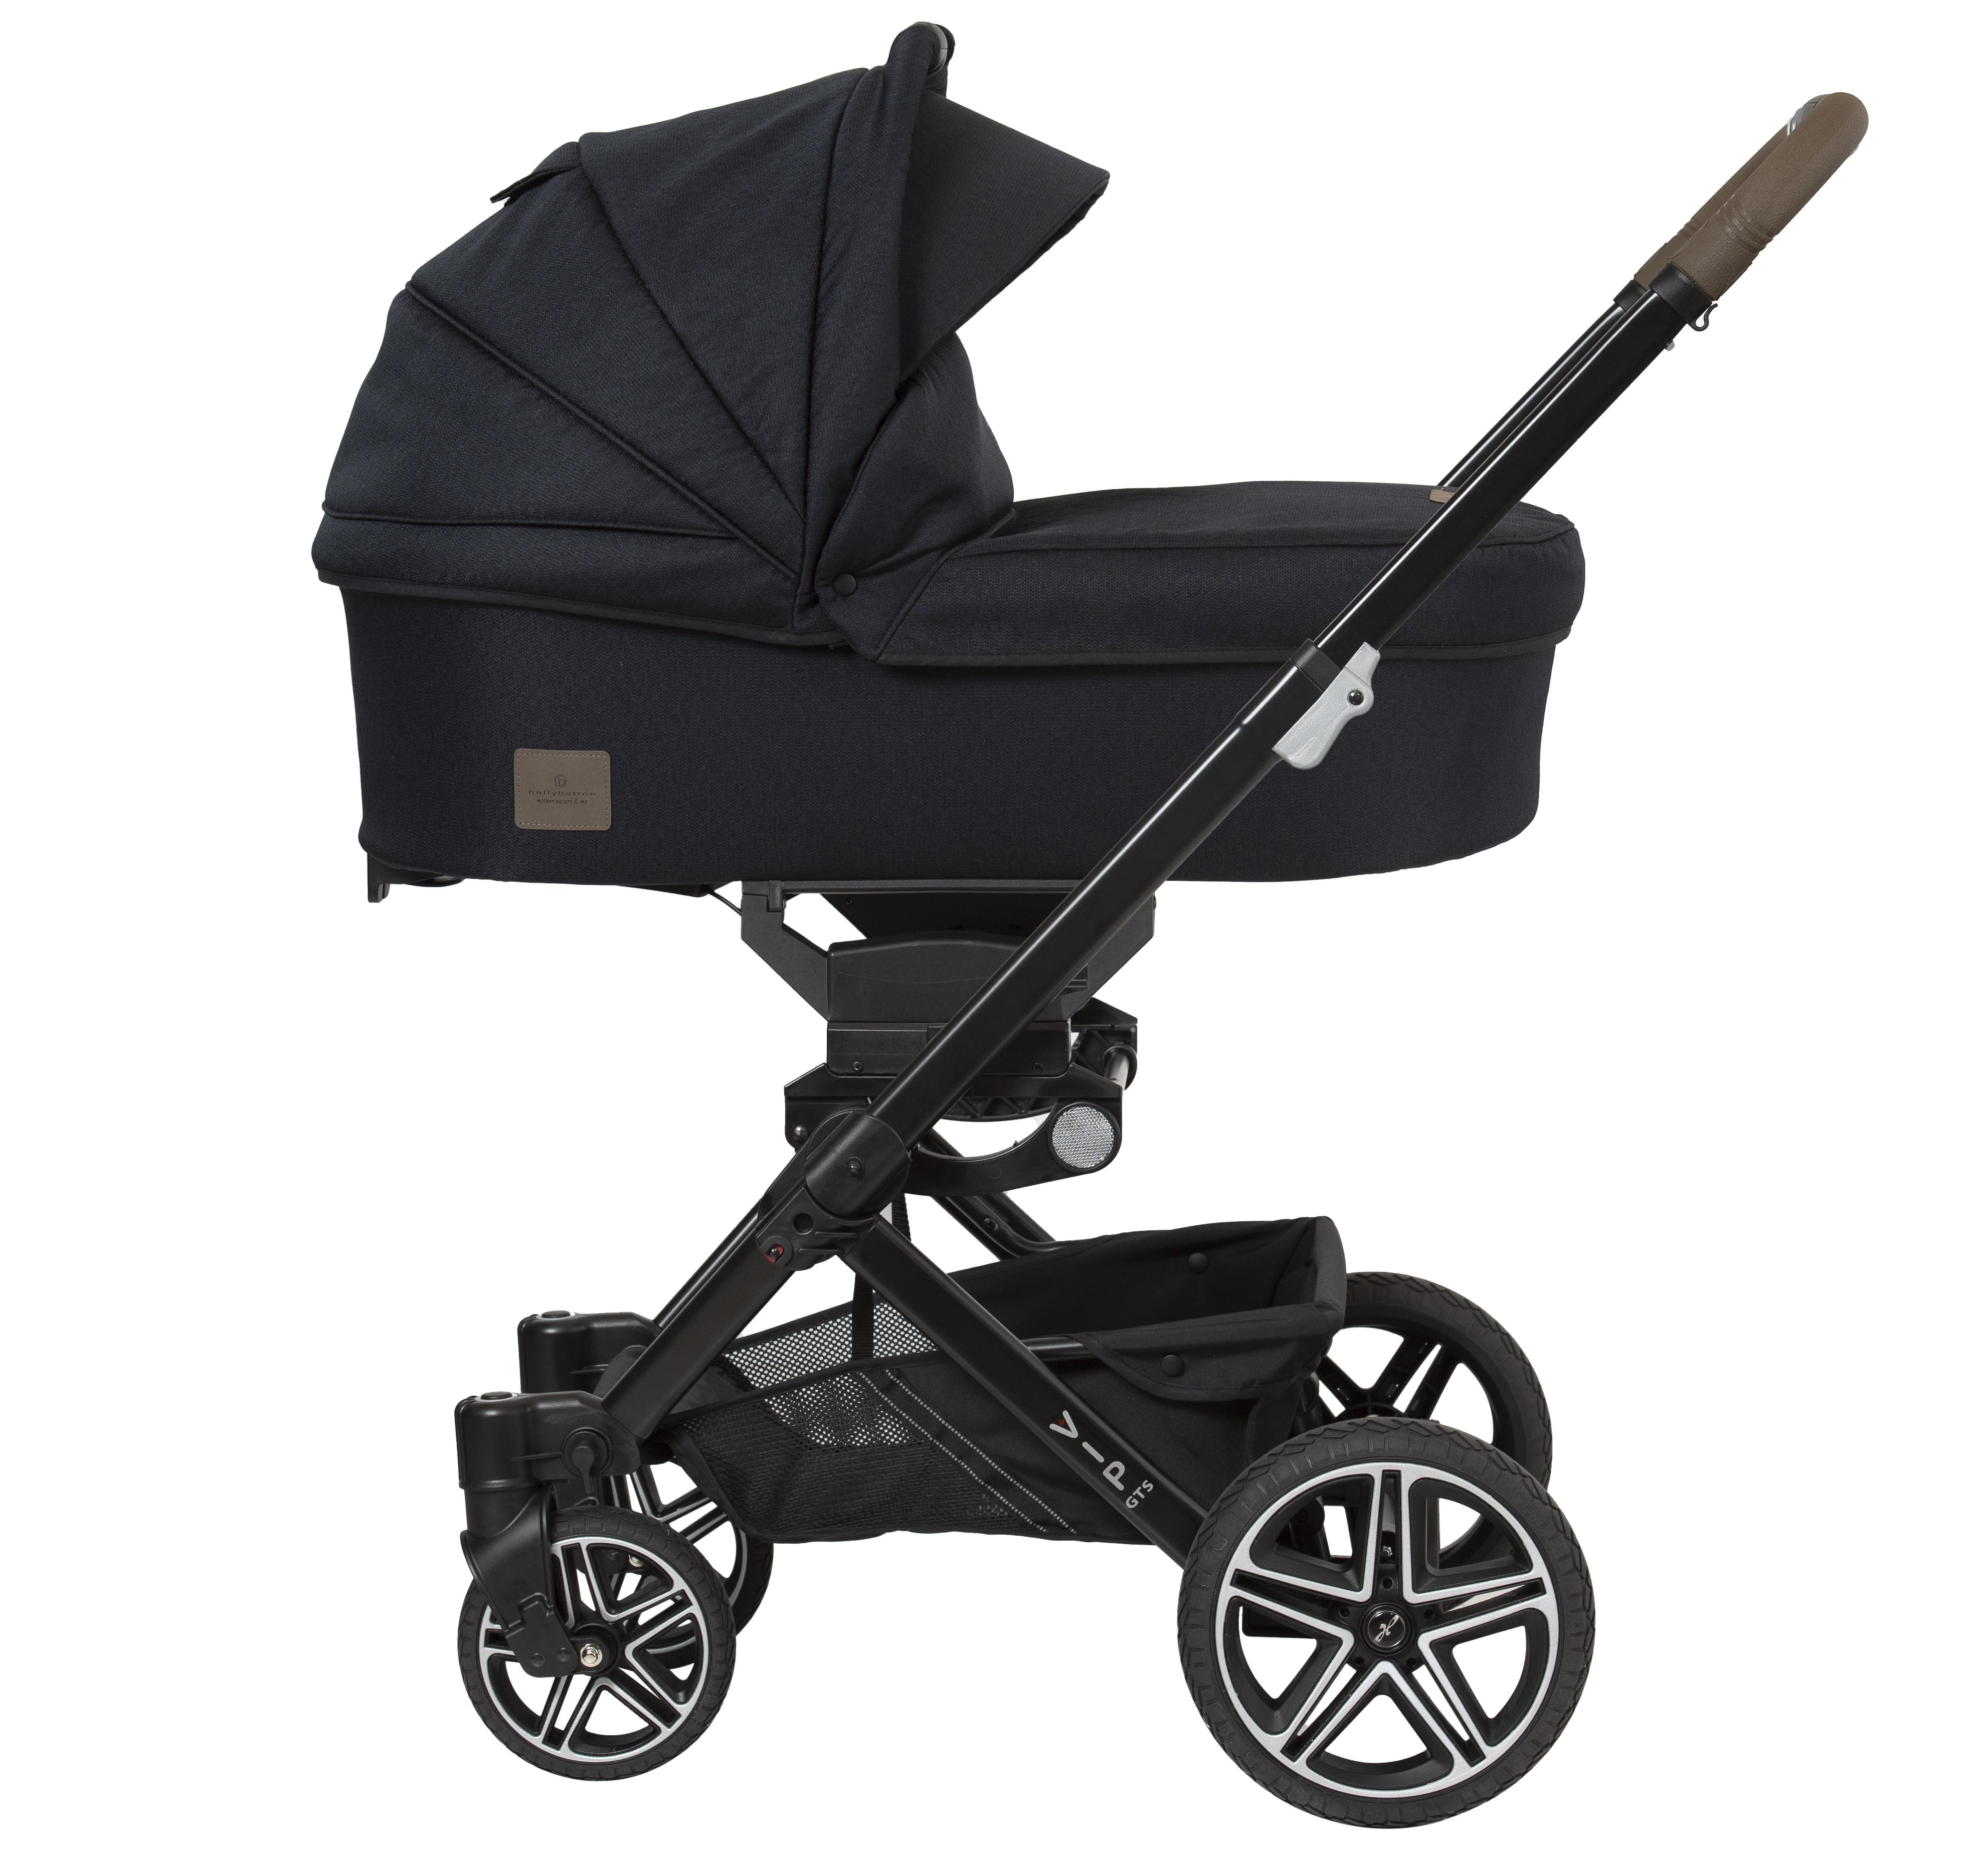 HARTAN Vip GTS bellybutton (2021) Kombi-Kinderwagen